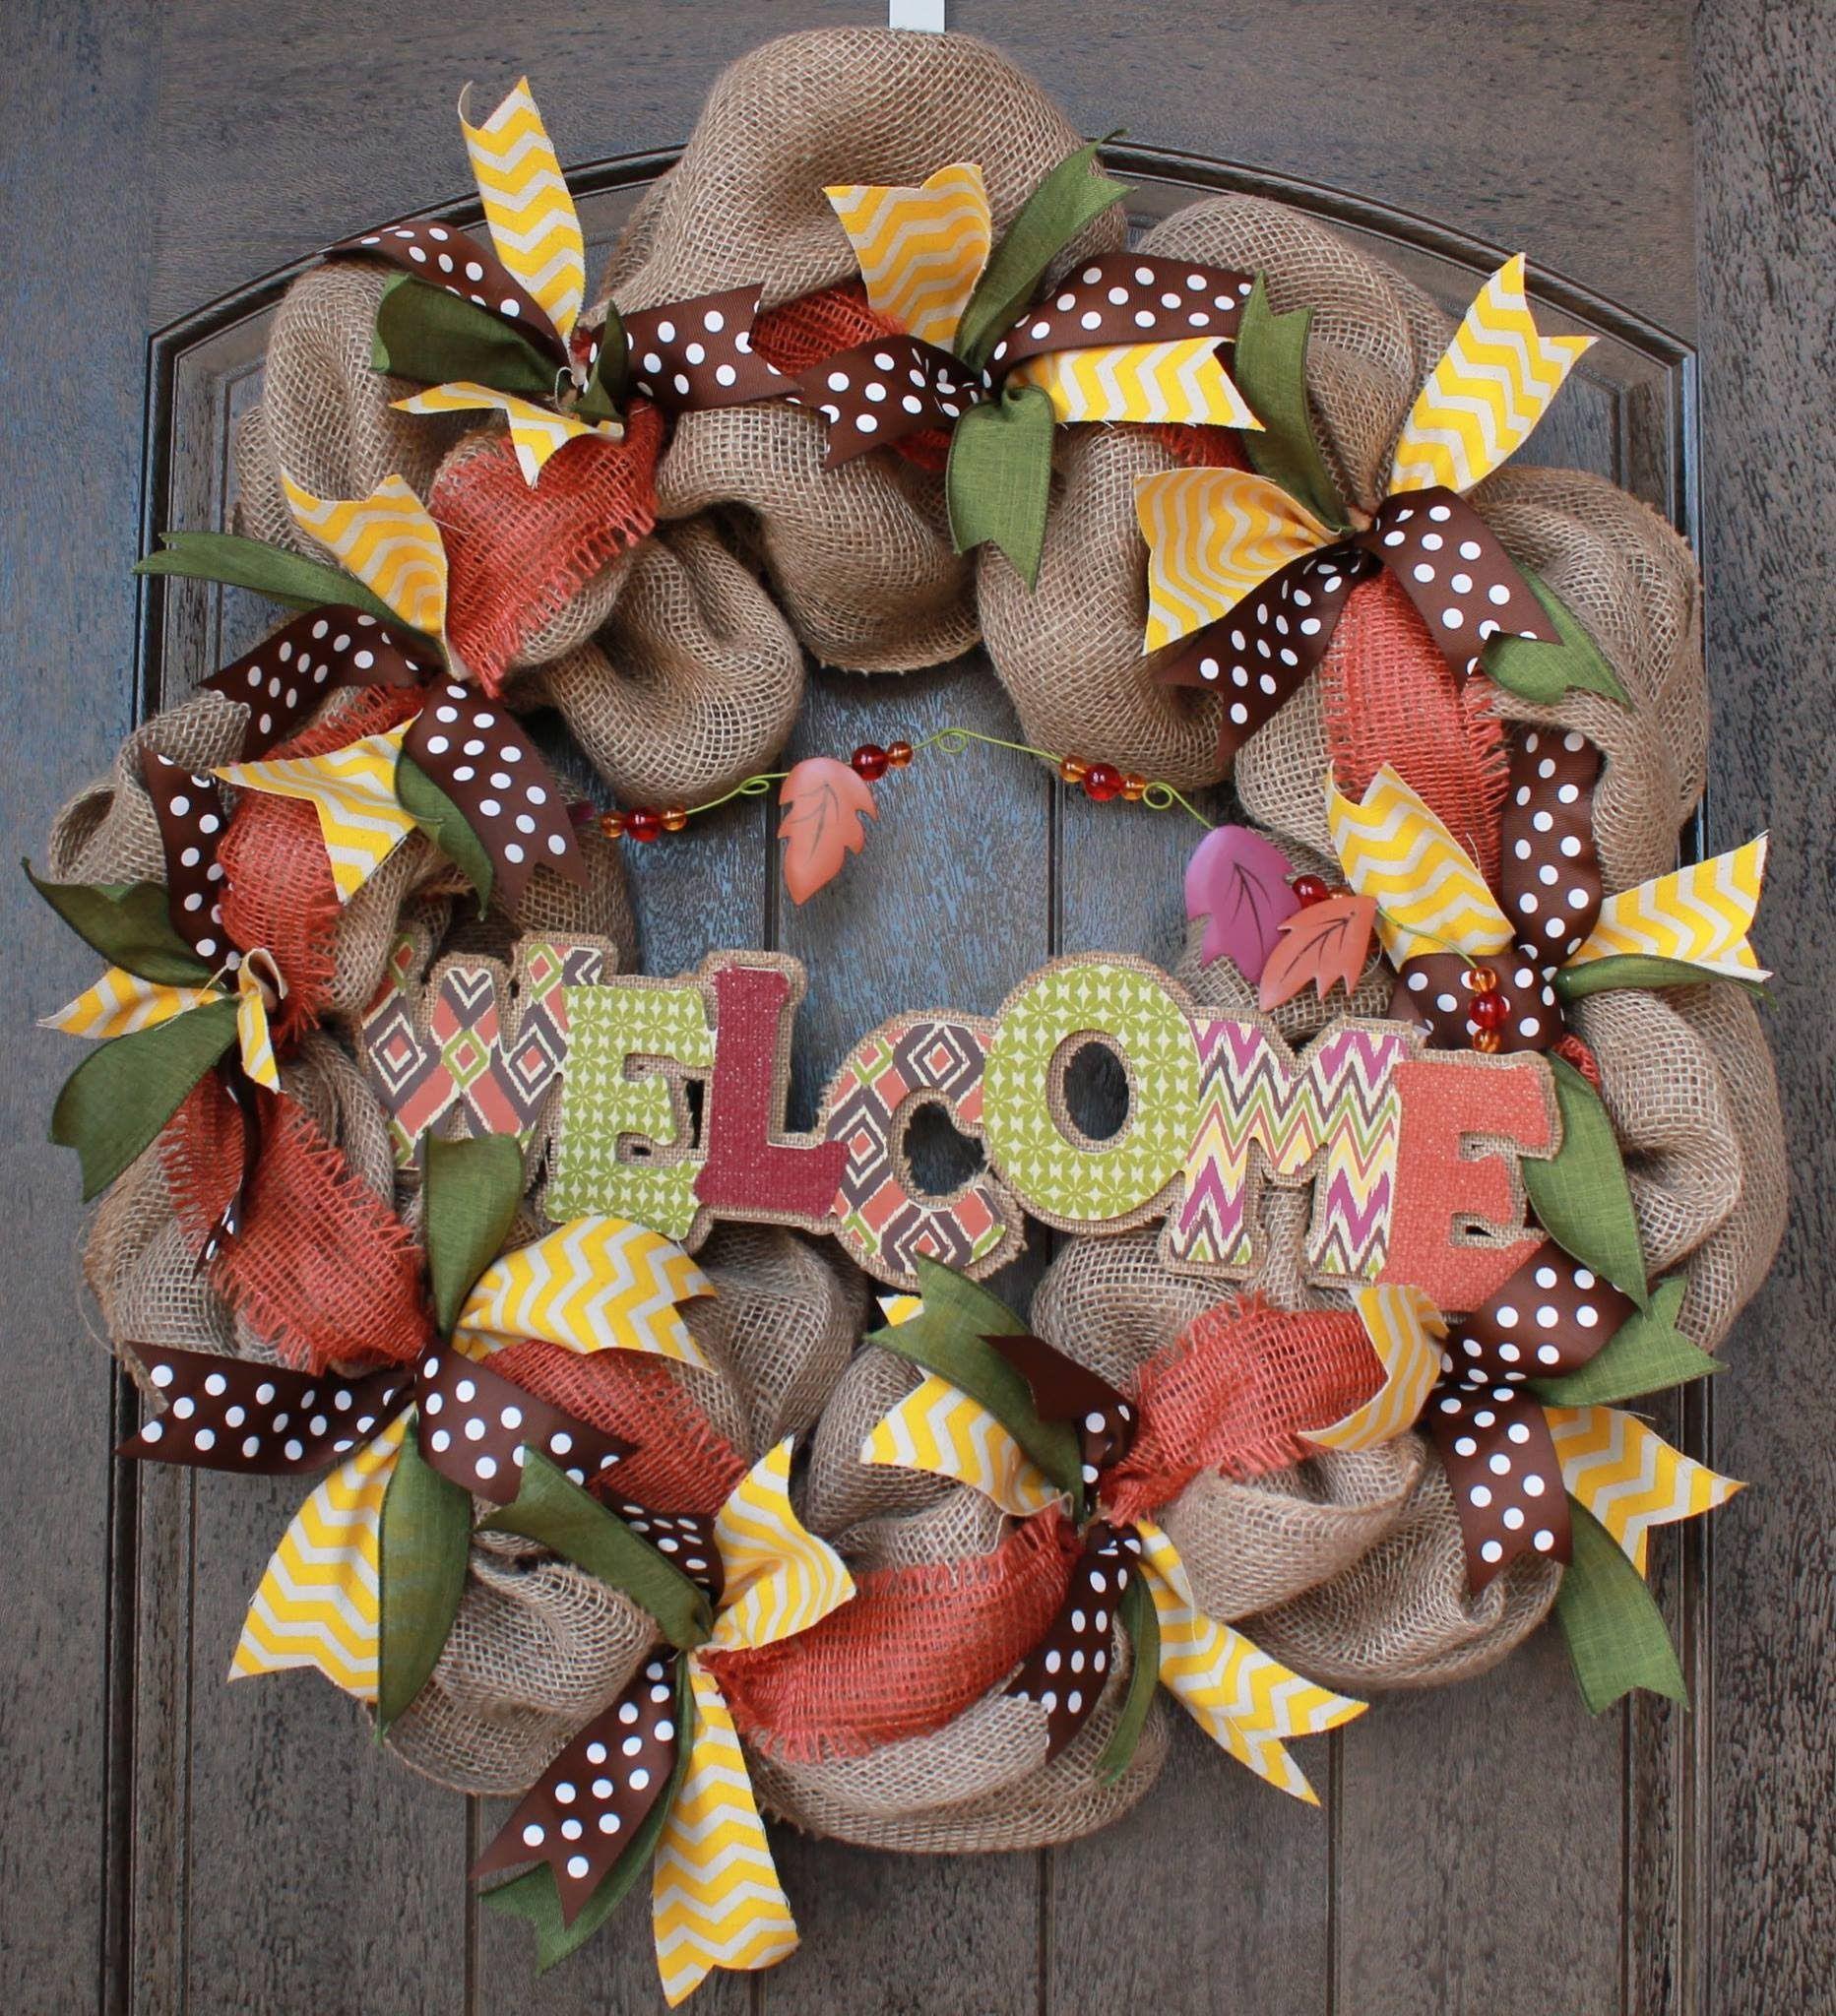 Ribbon wreath tutorial on wire hanger - Best 25 Ribbon Wreath Tutorial Ideas On Pinterest Classroom Wreath Diy Diy Spring Wreath Burlap And Wreath Making